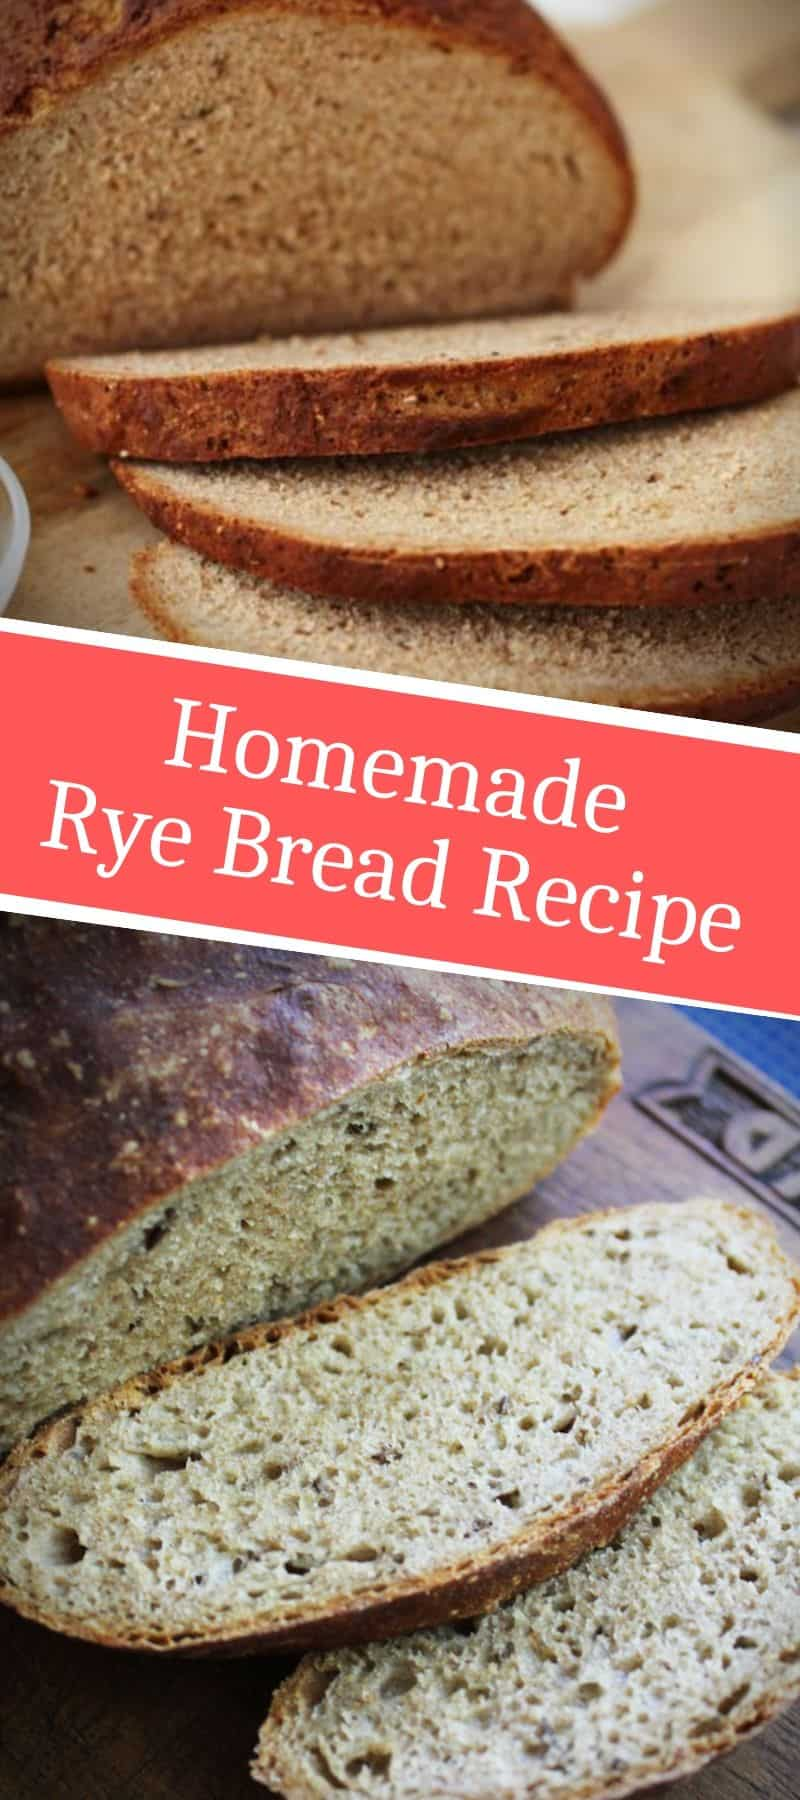 Homemade Rye Bread Recipe 3